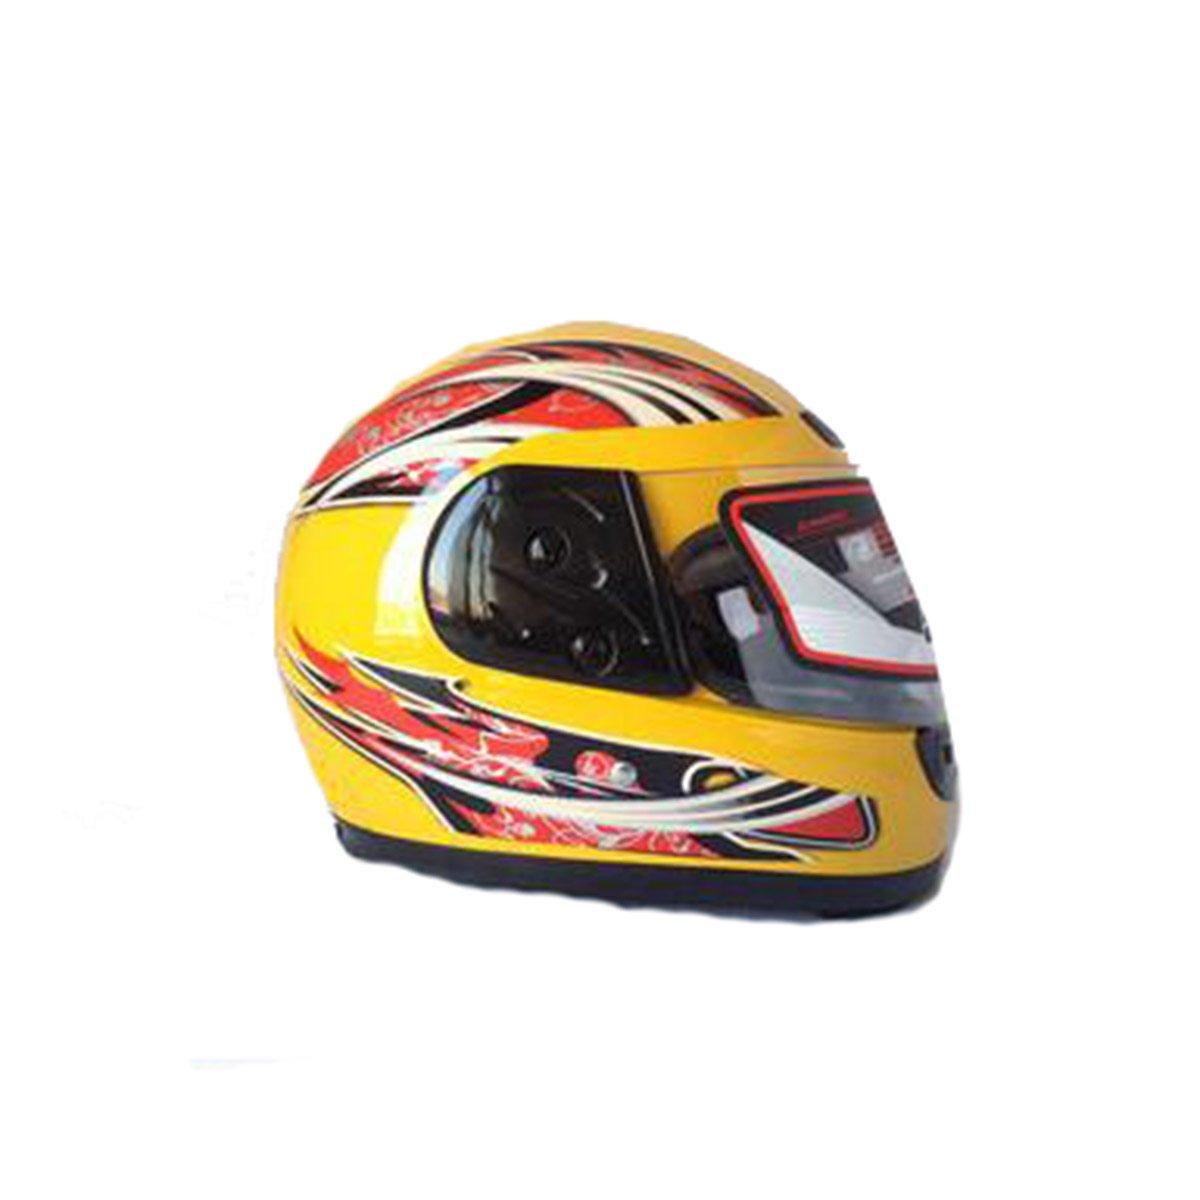 TZQ Helm Warm Open Helm Dame Maske Männer Helm Schutzbrillen Half Open Motorrad Helm